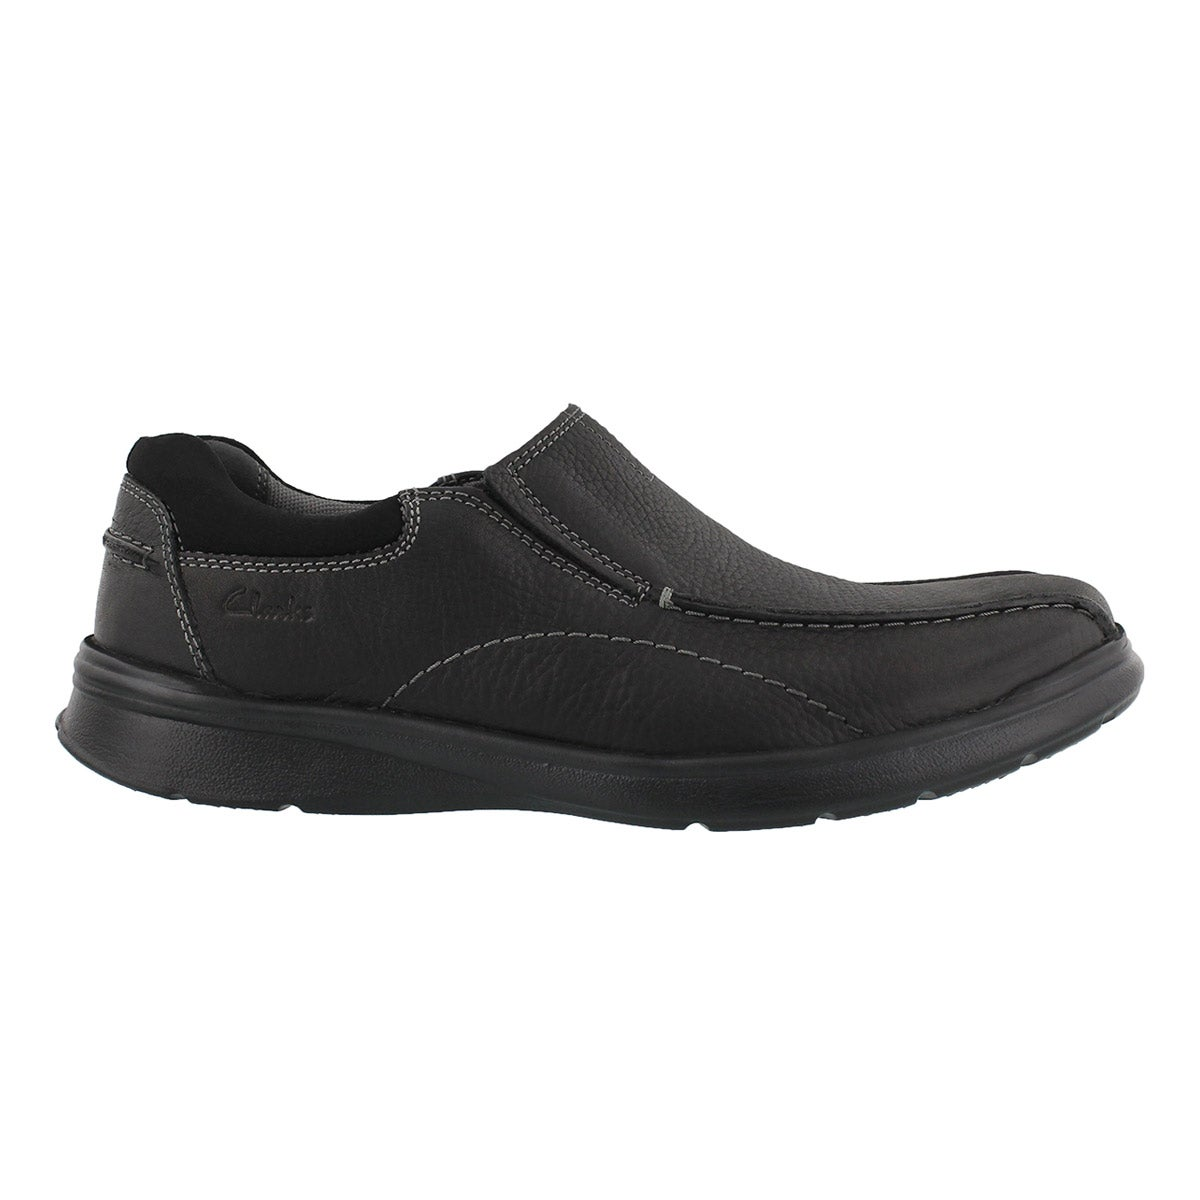 Mns Cotrell Step black slip on - medium